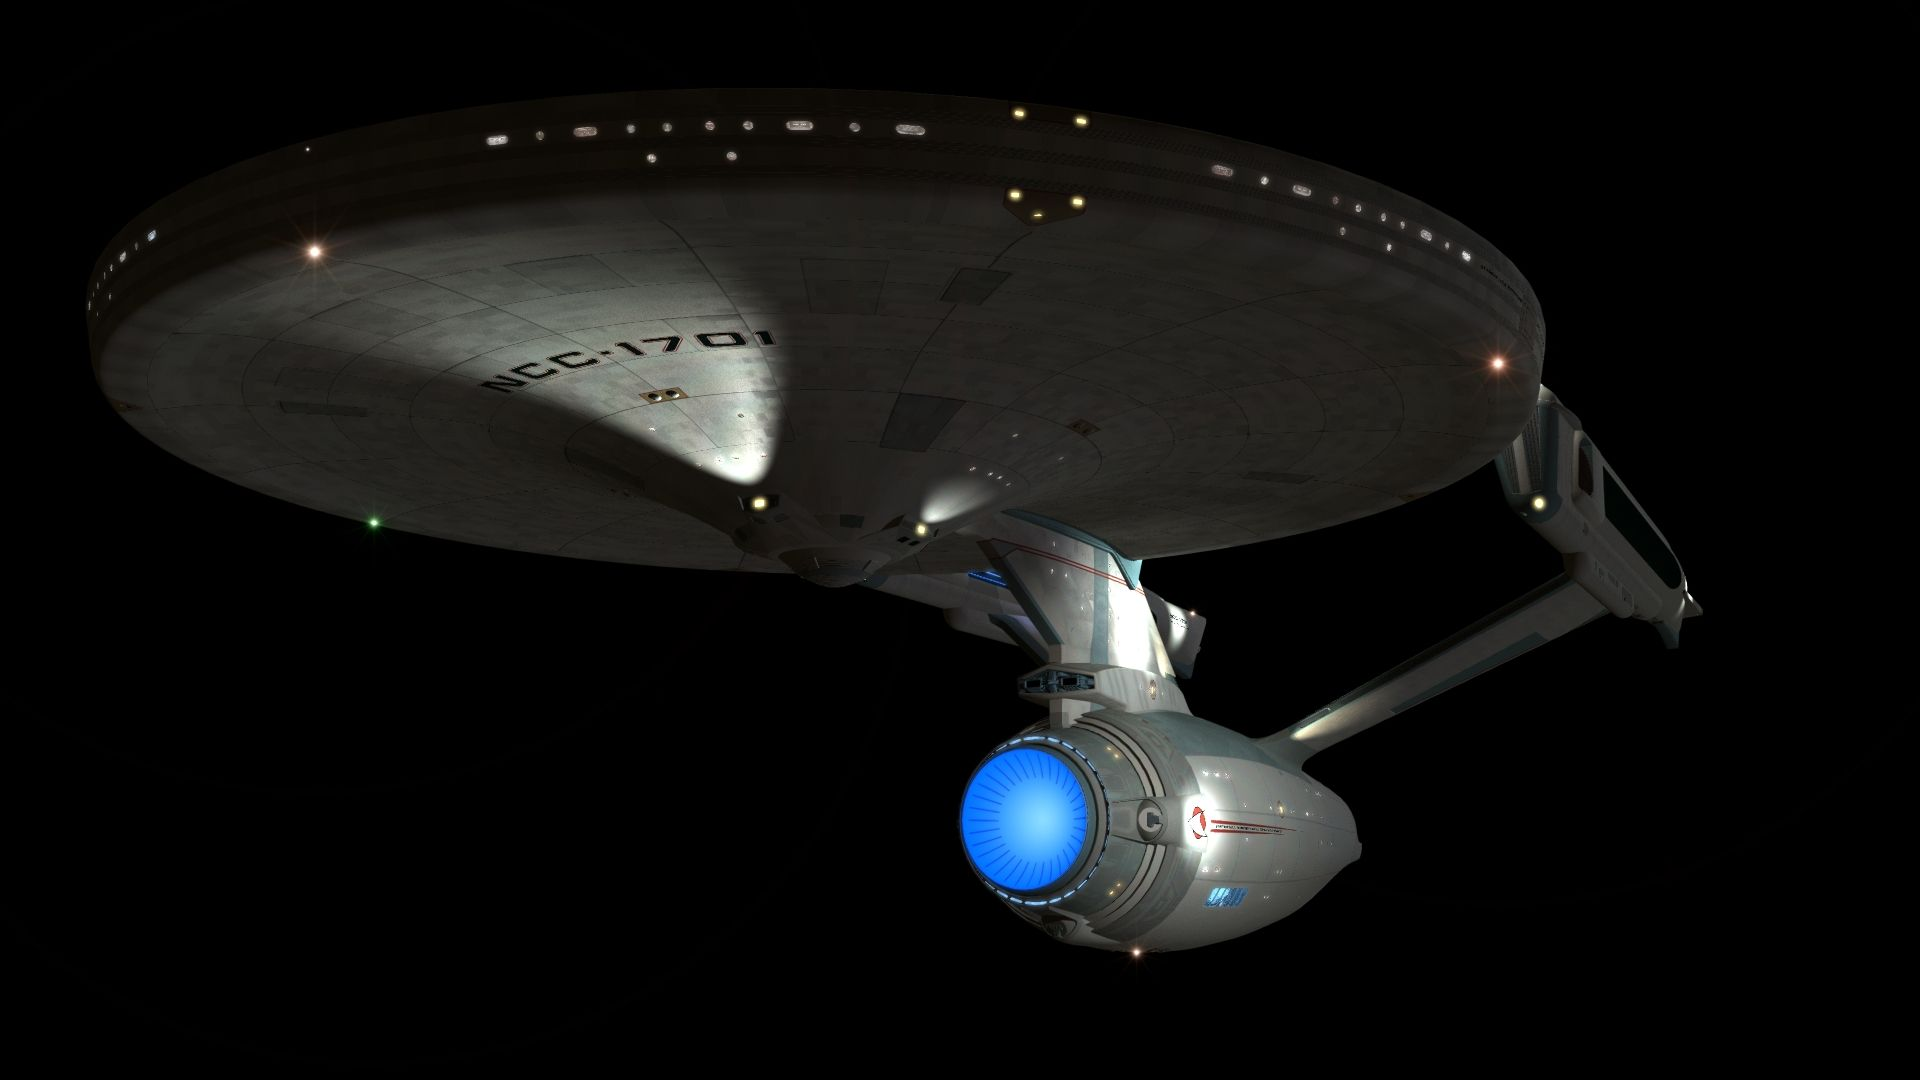 Star Trek Wallpaper 1920x1080 Star Trek USS Enterprise 1920x1080